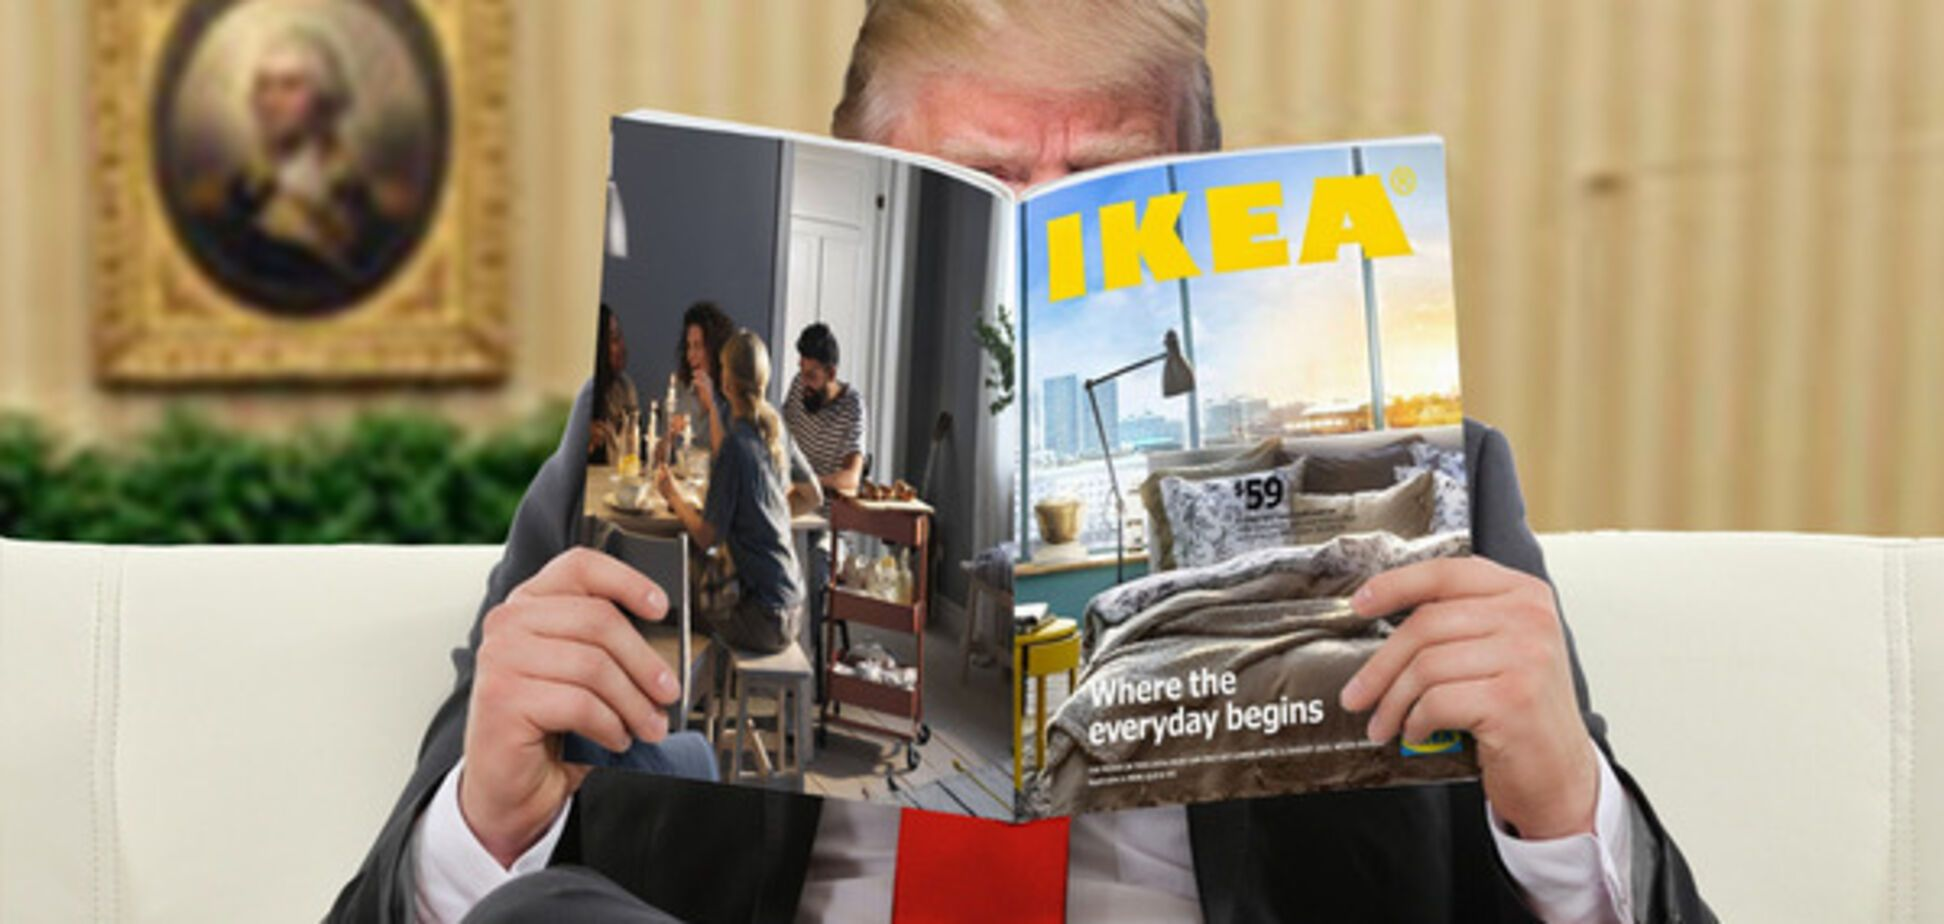 Дональд Трамп с журналом IKEA